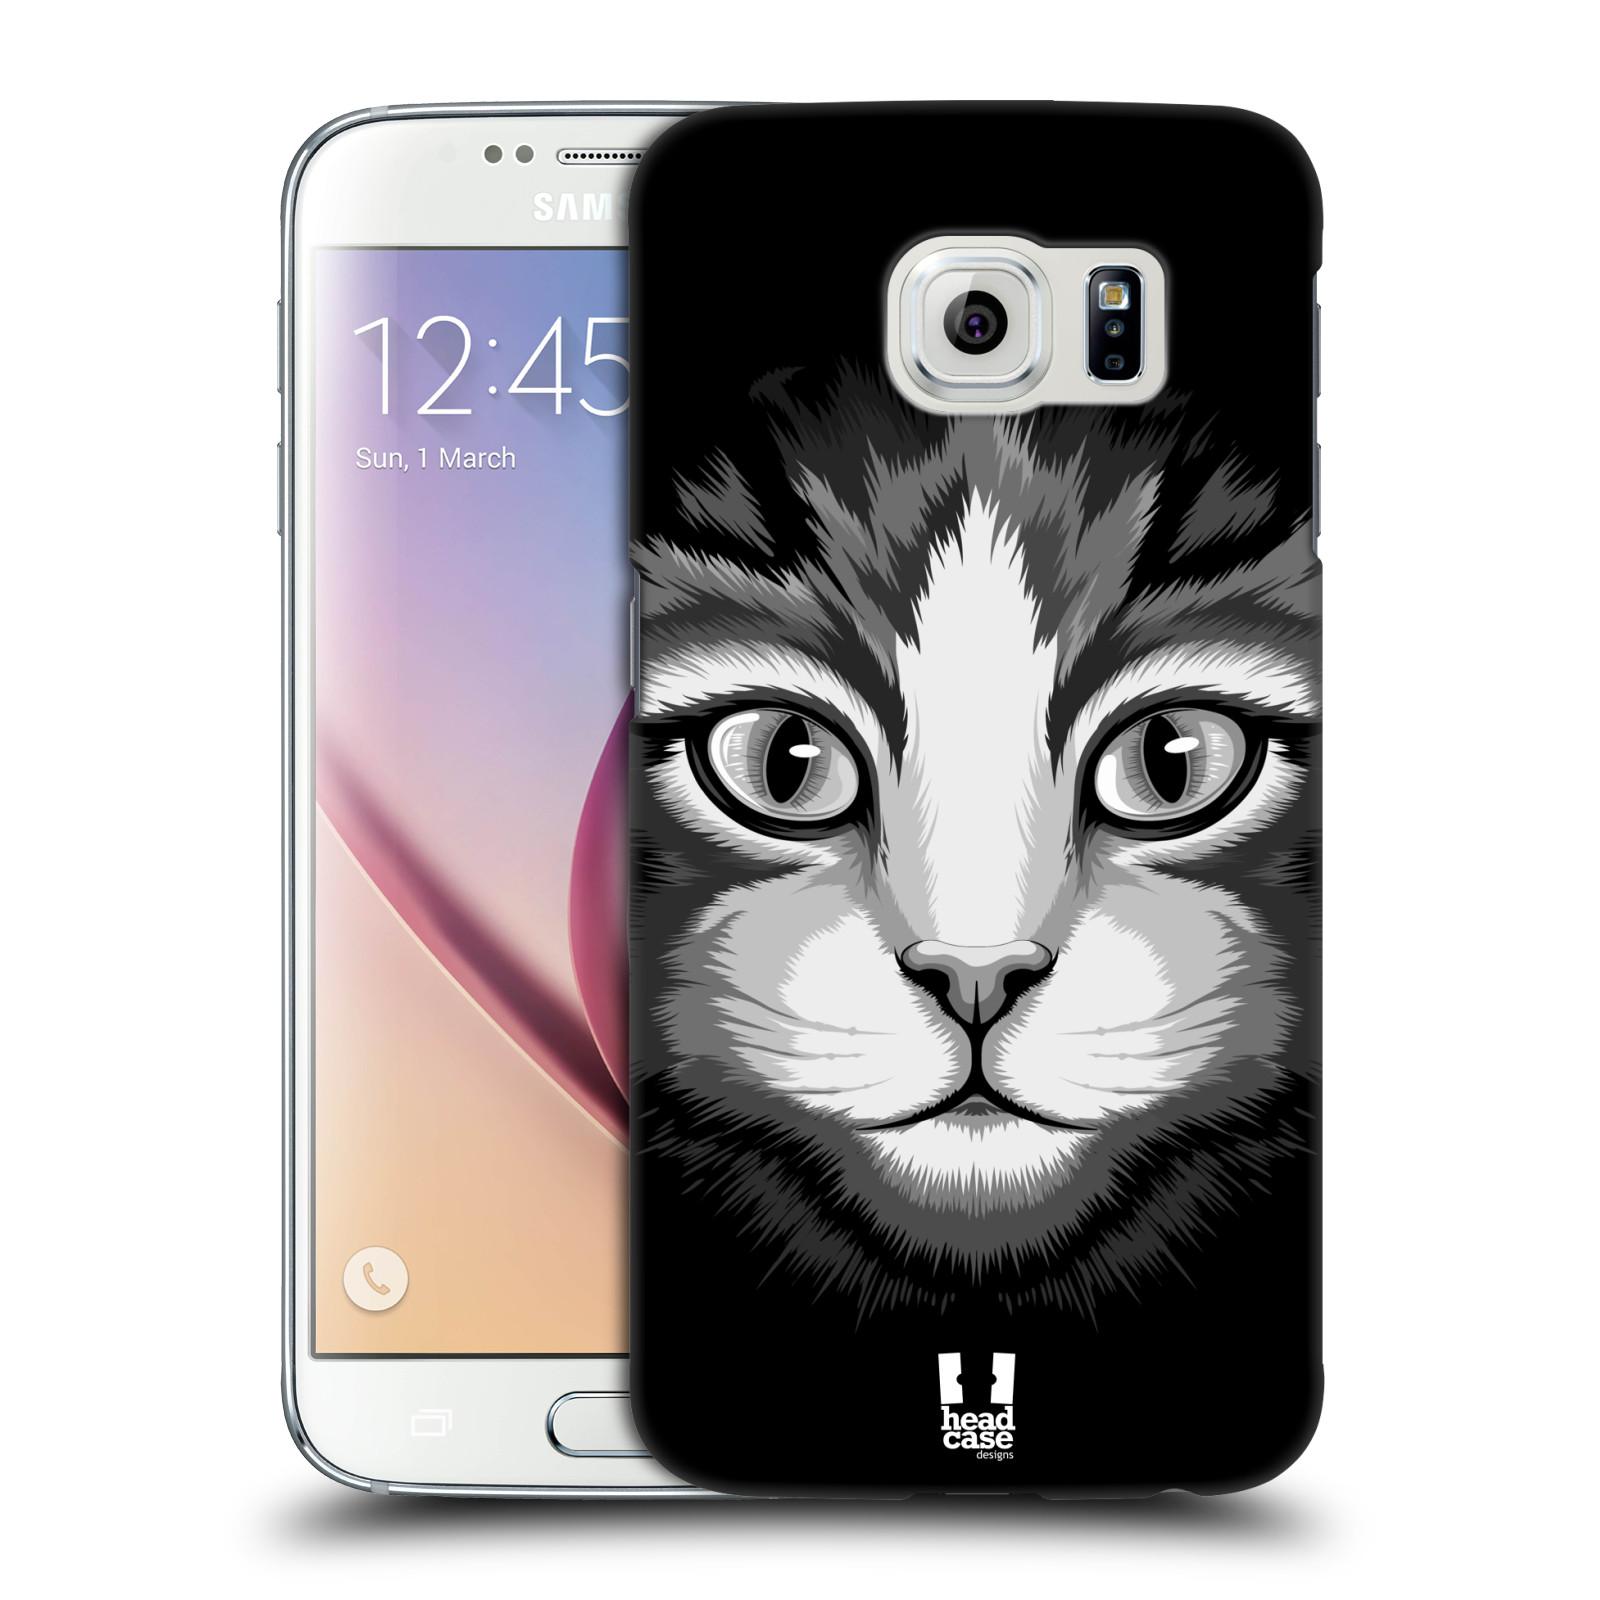 HEAD CASE plastový obal na mobil SAMSUNG Galaxy S6 (G9200, G920F) vzor Zvíře kreslená tvář 2 kočička